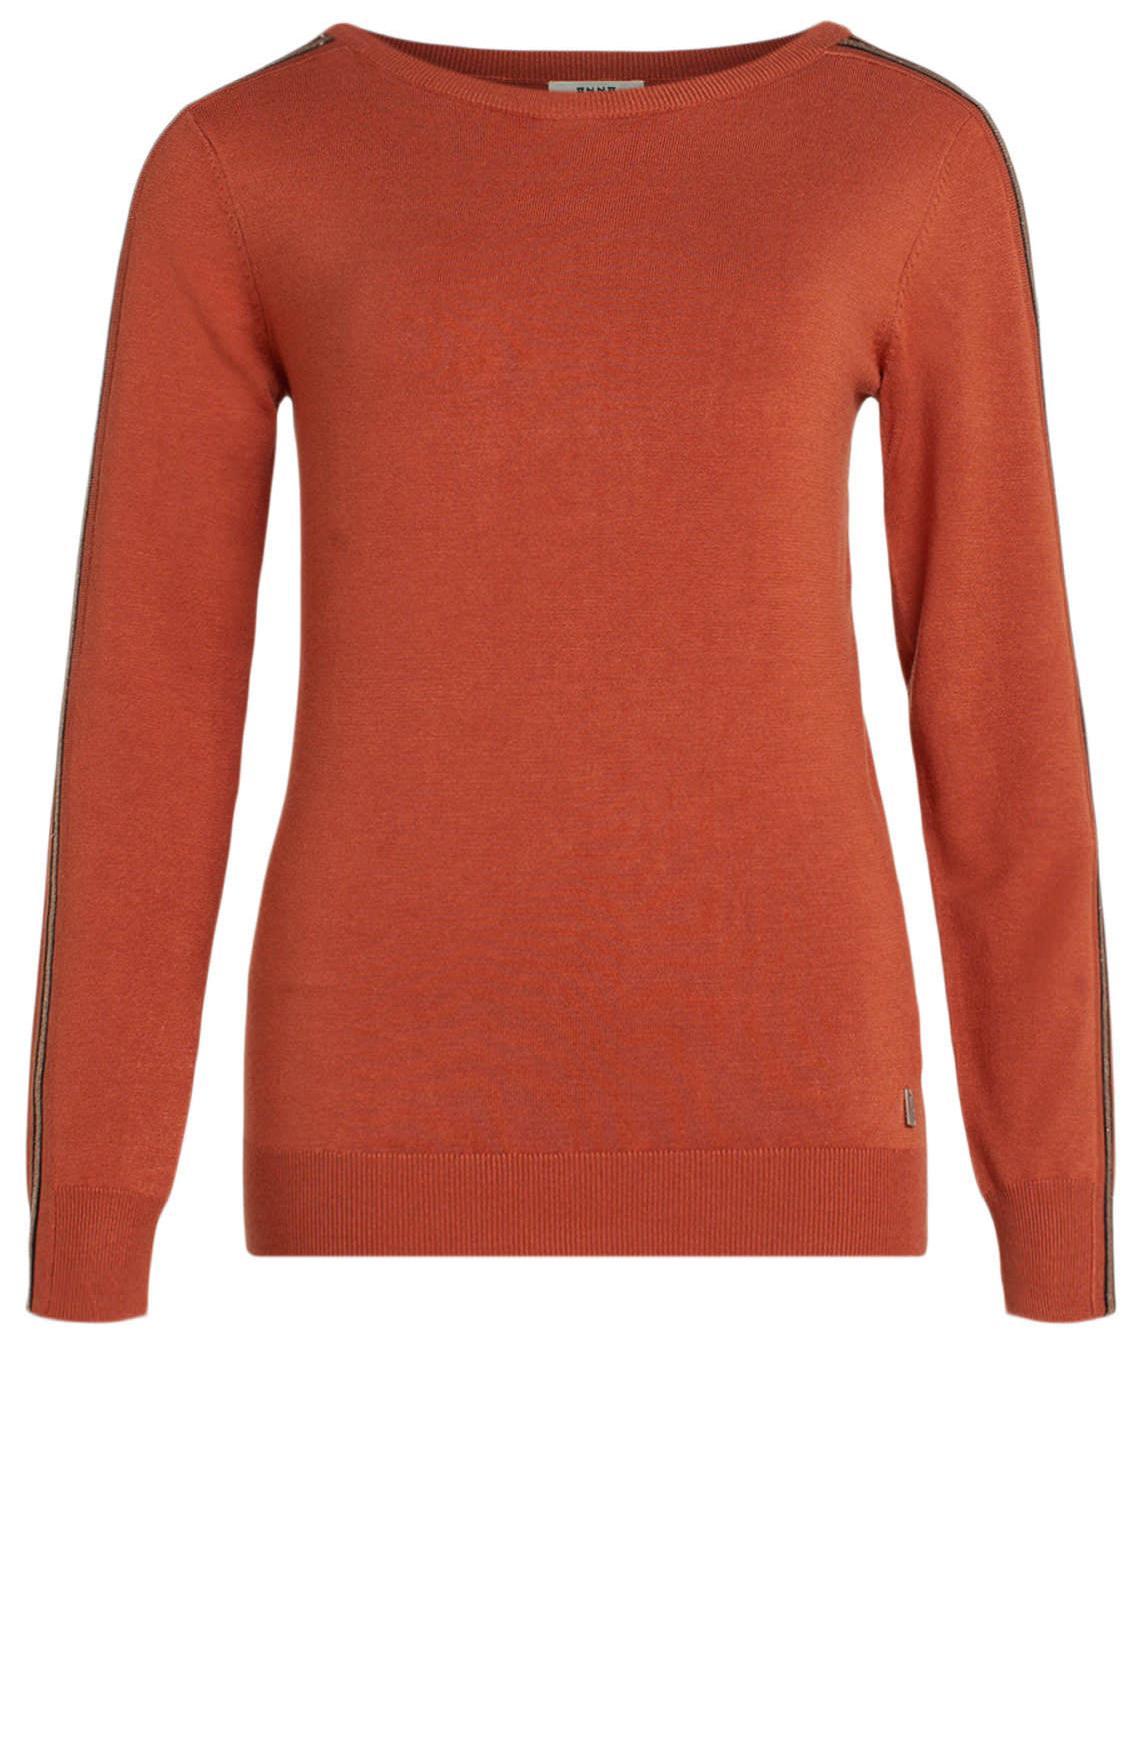 Anna Dames Pullover met lurex bies Oranje